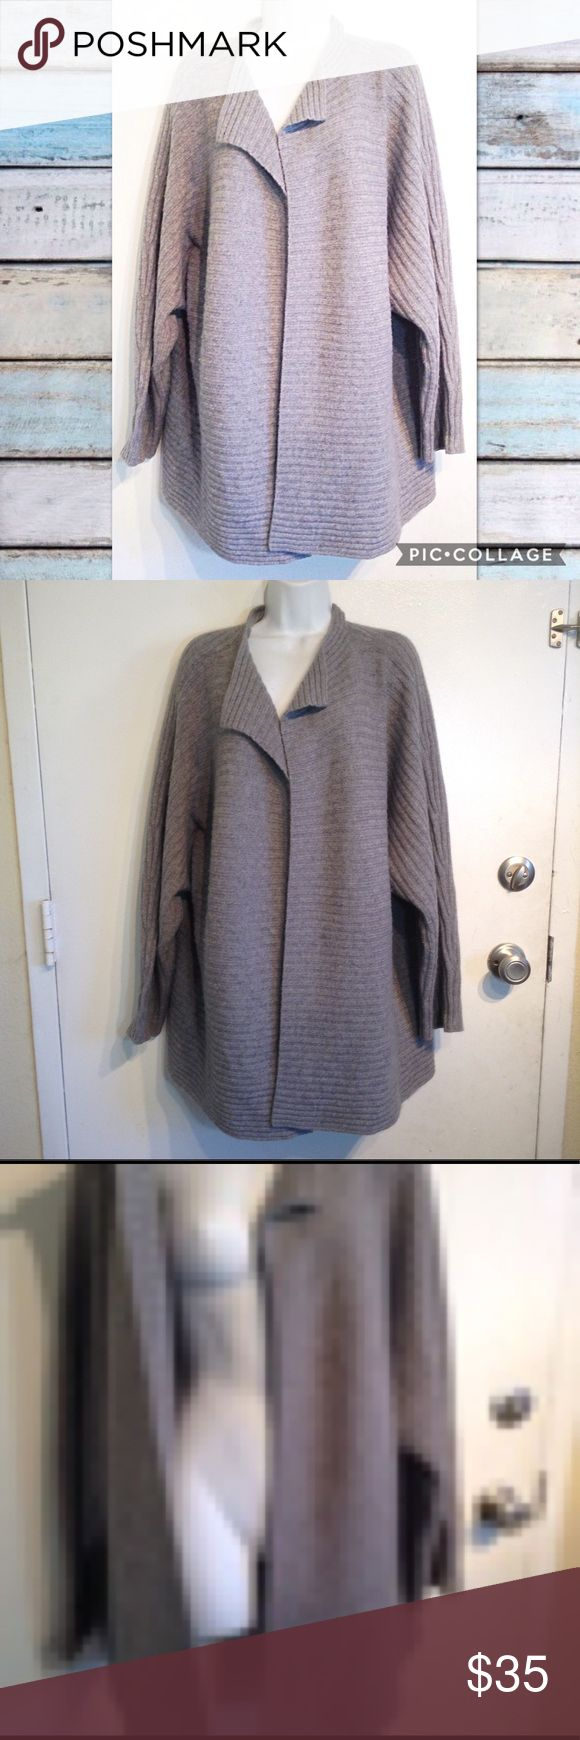 MODERN SOUL Plus Size Grey Knit Cardigan Sweater Modern Soul from QVC plus size grey knit open front long cardigan sweater. Warm and cozy. Nice quality. 50% wool, 30% rayon, 12% nylon, 8% angora rabbit hair. Perfect for layering. Size 2x. No modeling. Smoke free home. I do discount bundles. Modern Soul Sweaters Cardigans